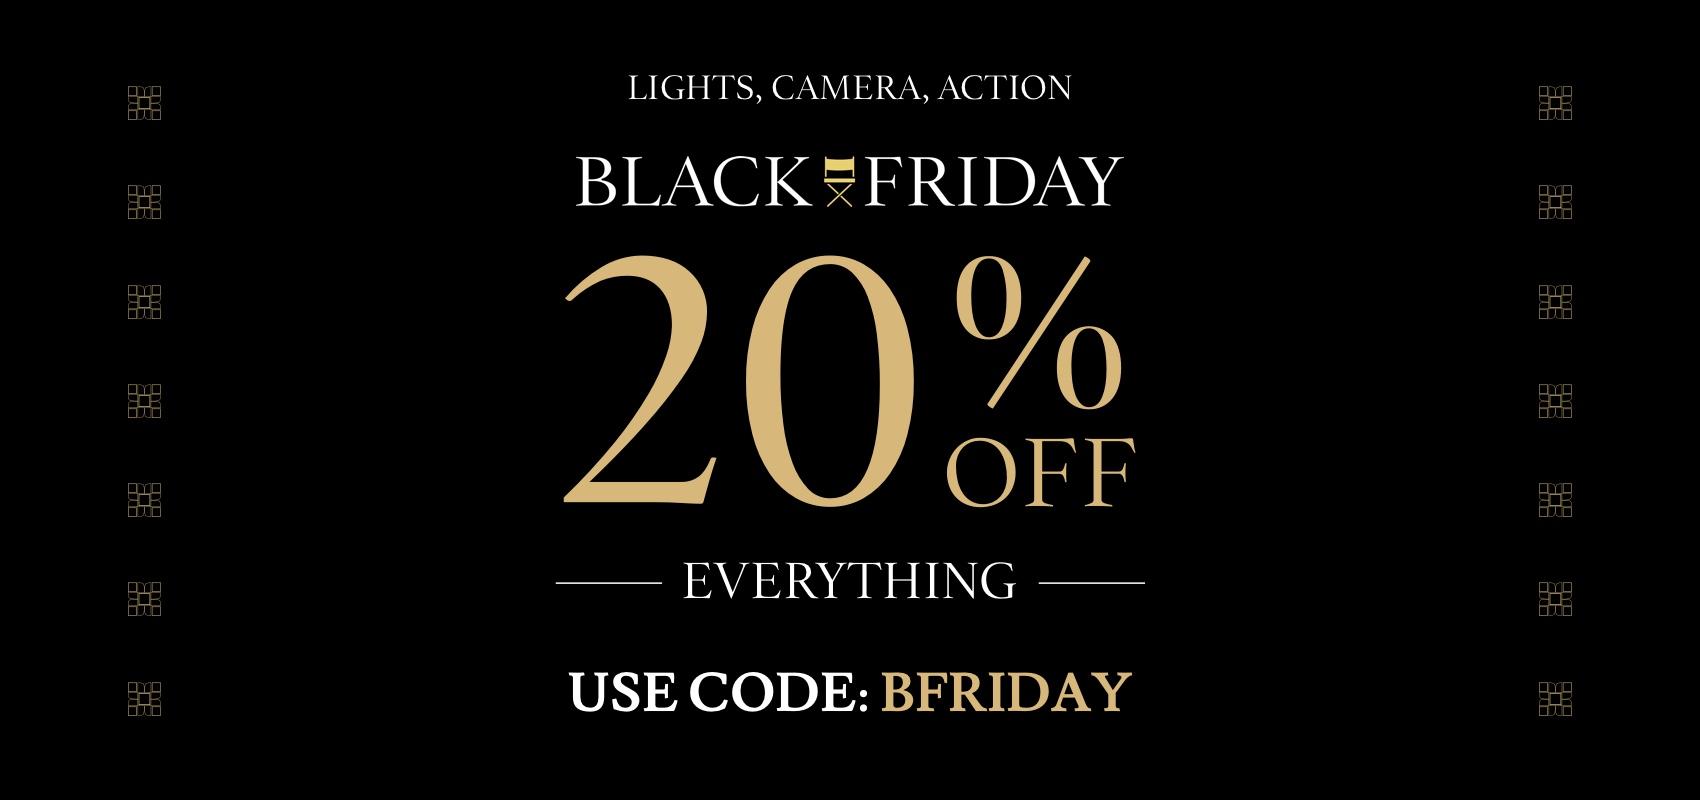 Charles Tyrwhitt Black Friday 20% off with code BFRIDAY